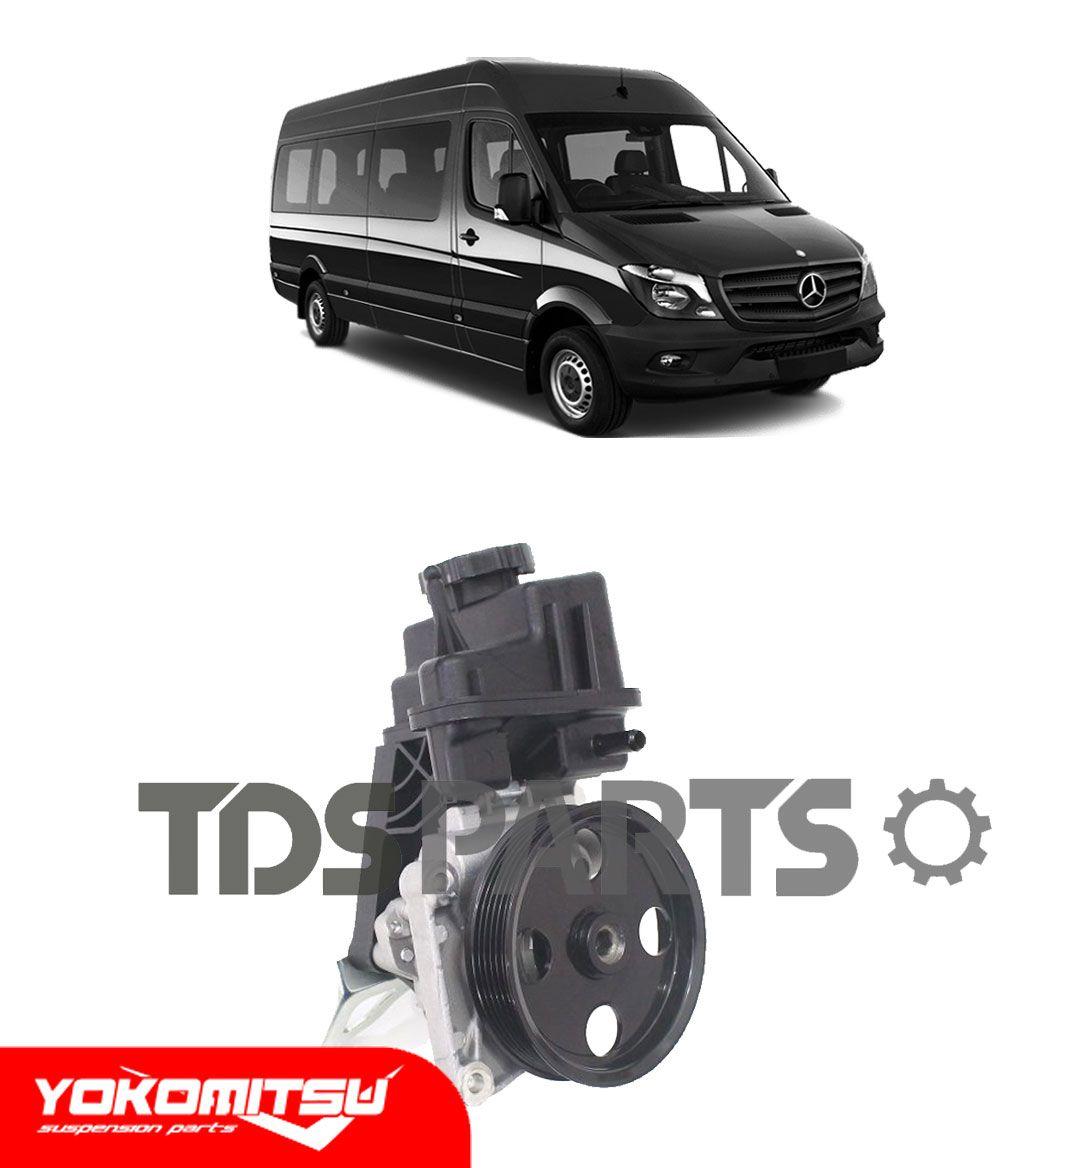 Bomba Direção Hidráulica Sprinter - Motor CDI